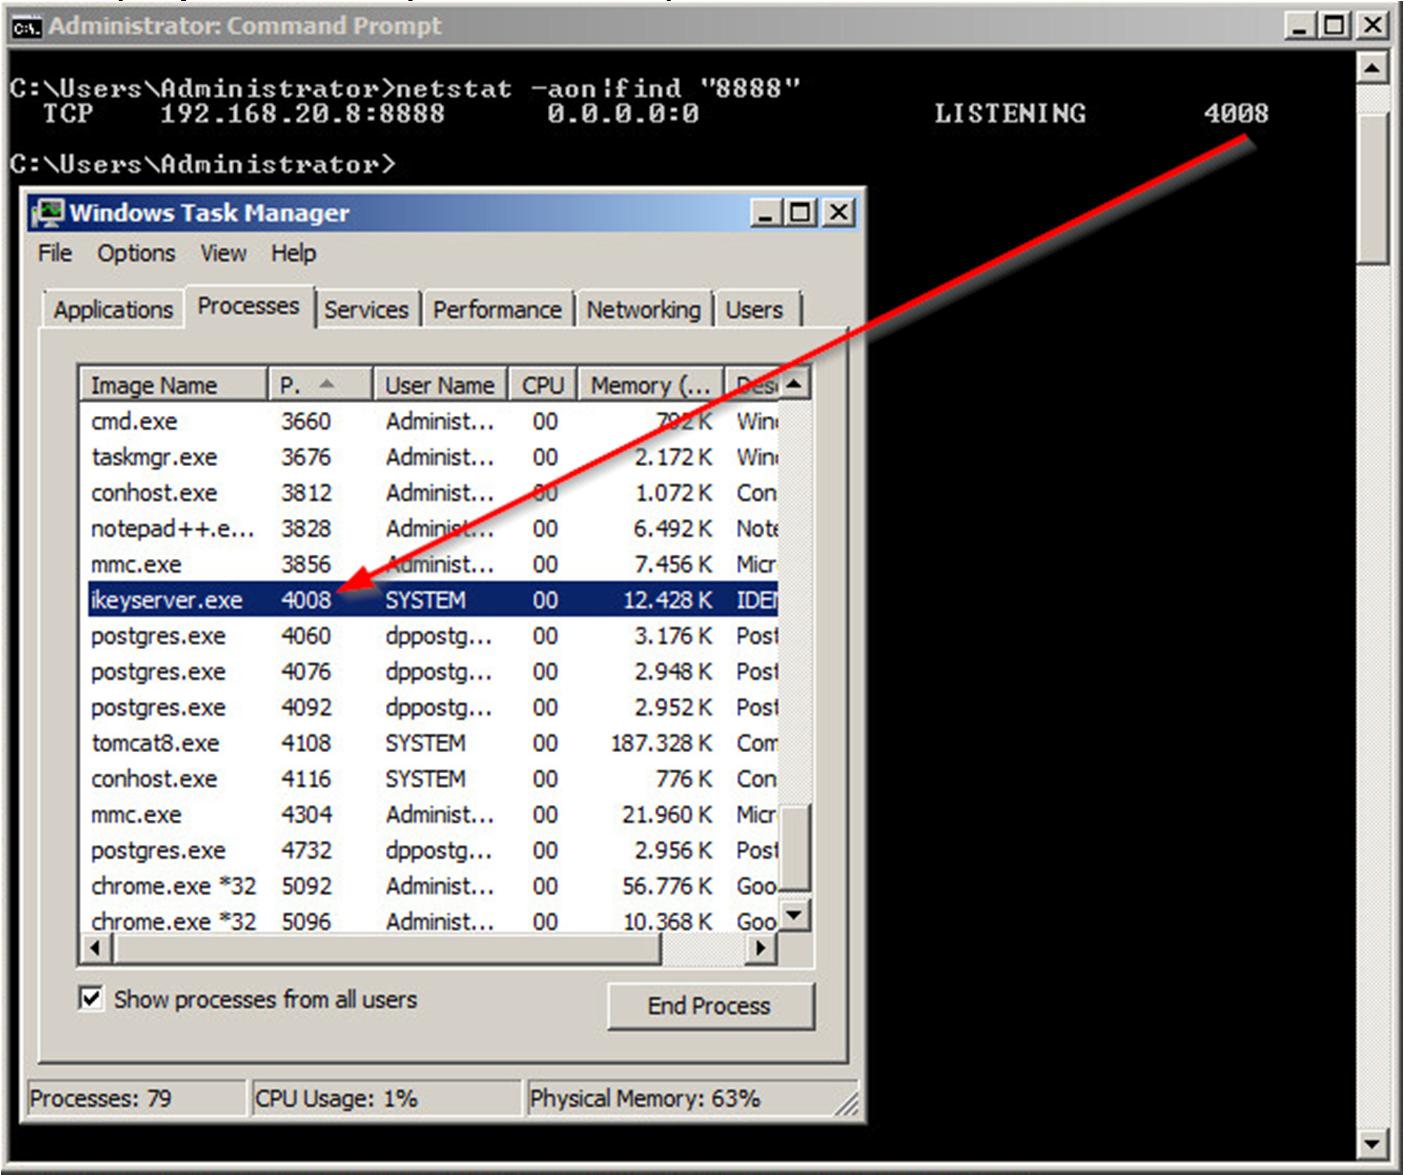 KB_150158: Troubleshooting login problems on IDENTIKEY